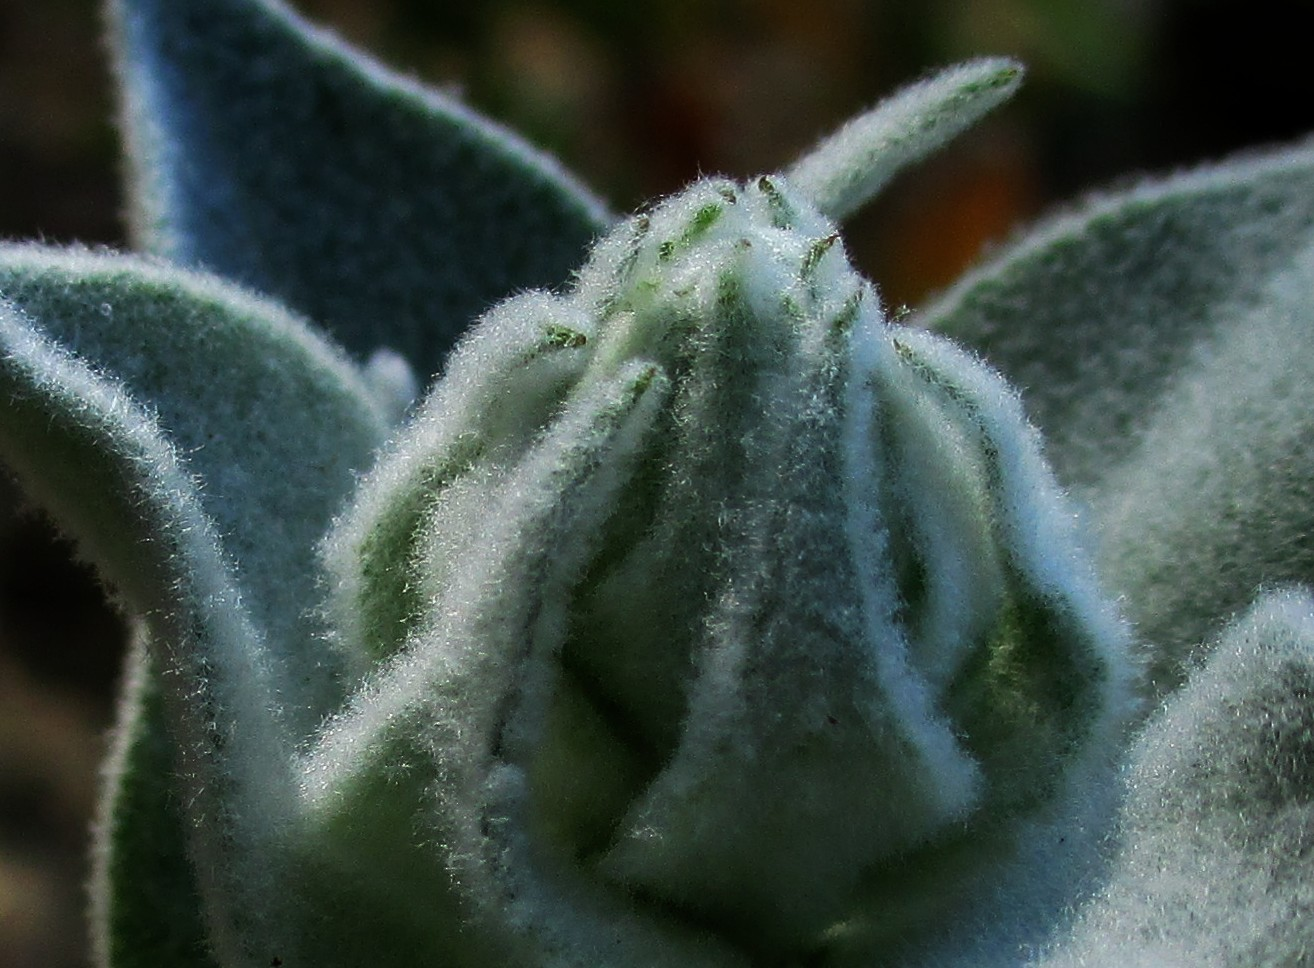 Verbascum olympicum - Kandelaber-Königskerze